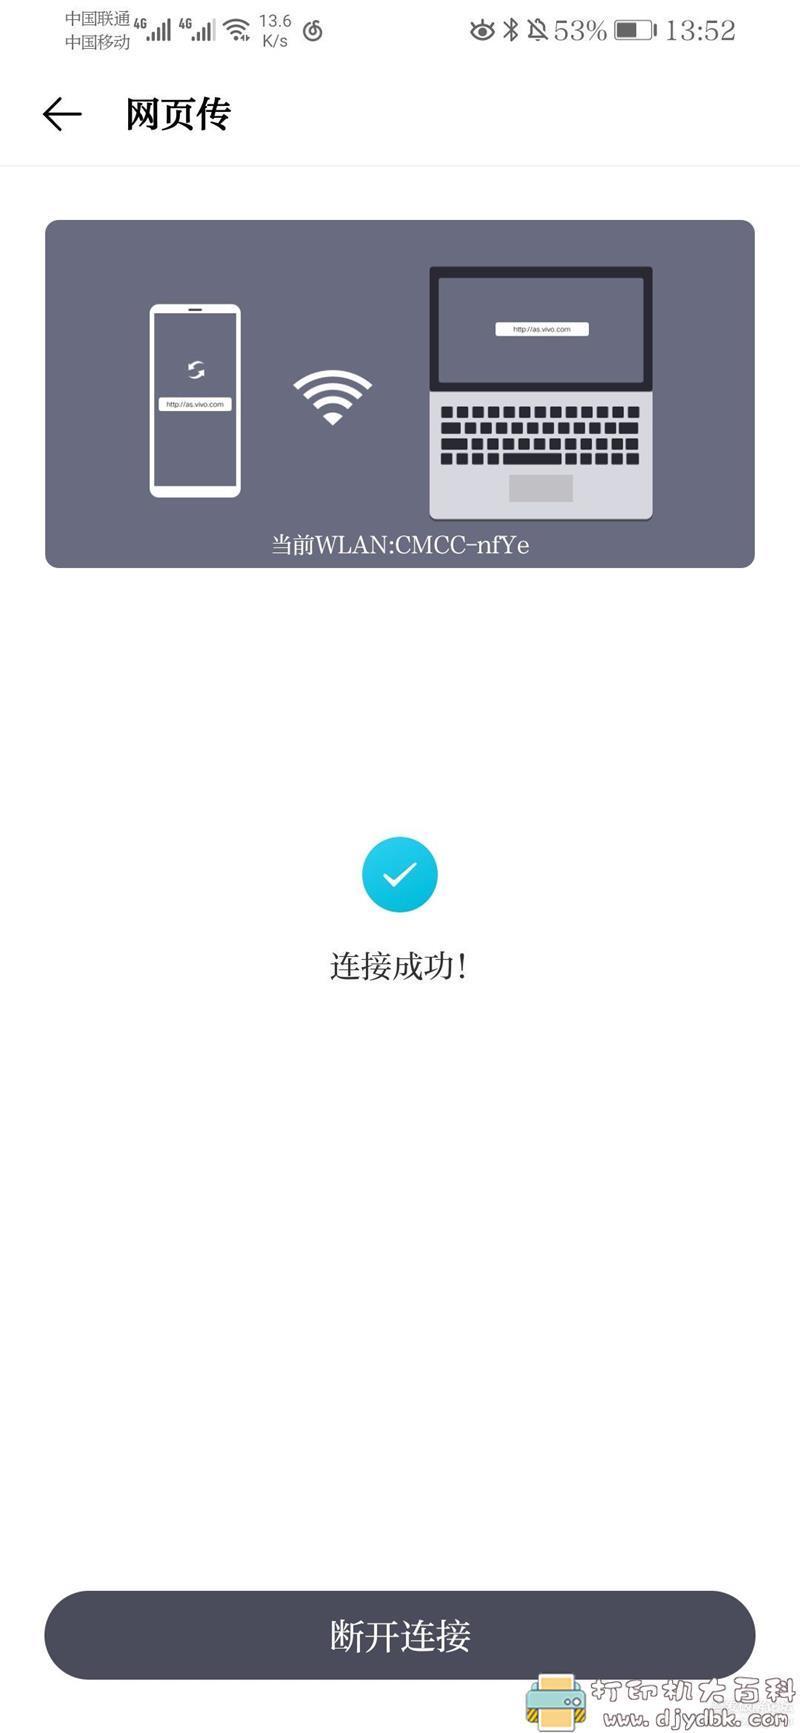 [Android]手机电脑互传文件工具 Easyshare_android_4.3.3.3图片 No.3